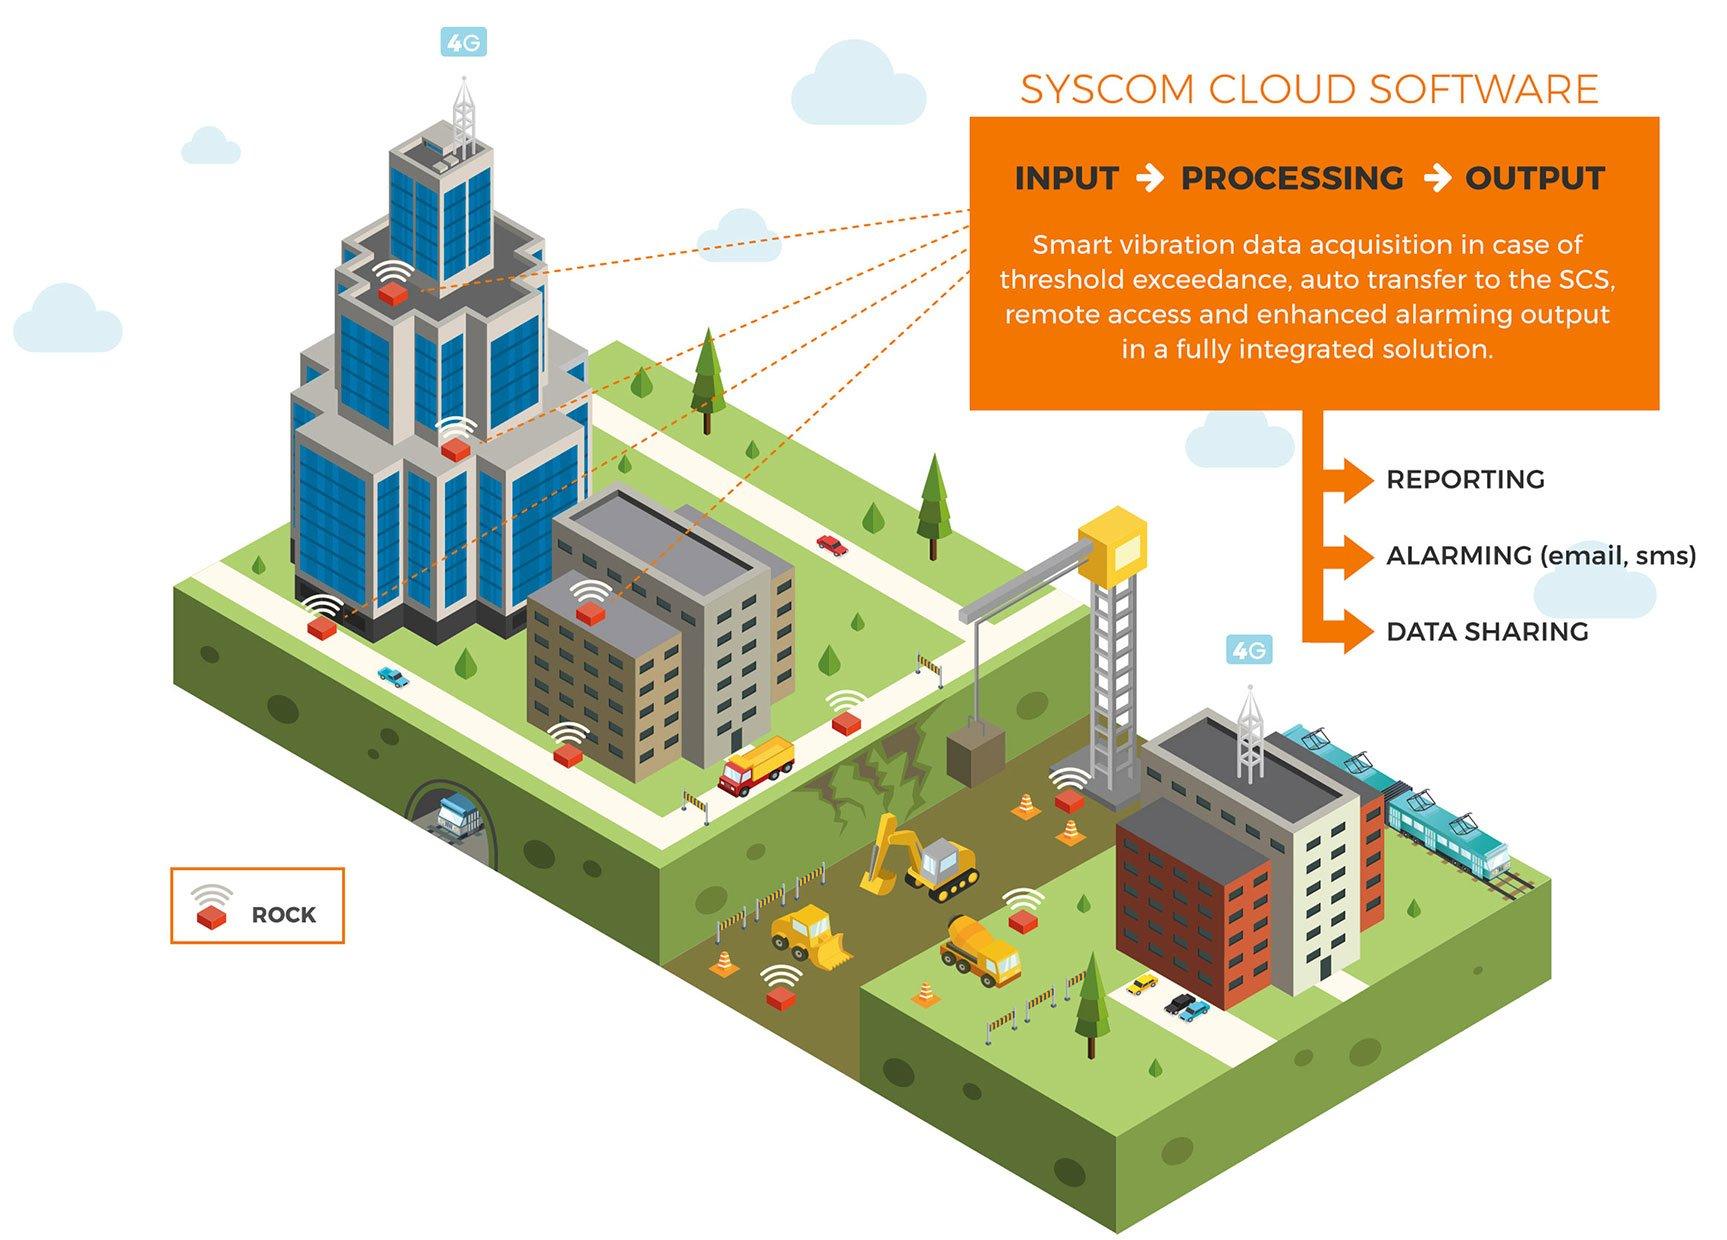 Syscom Cloud Software